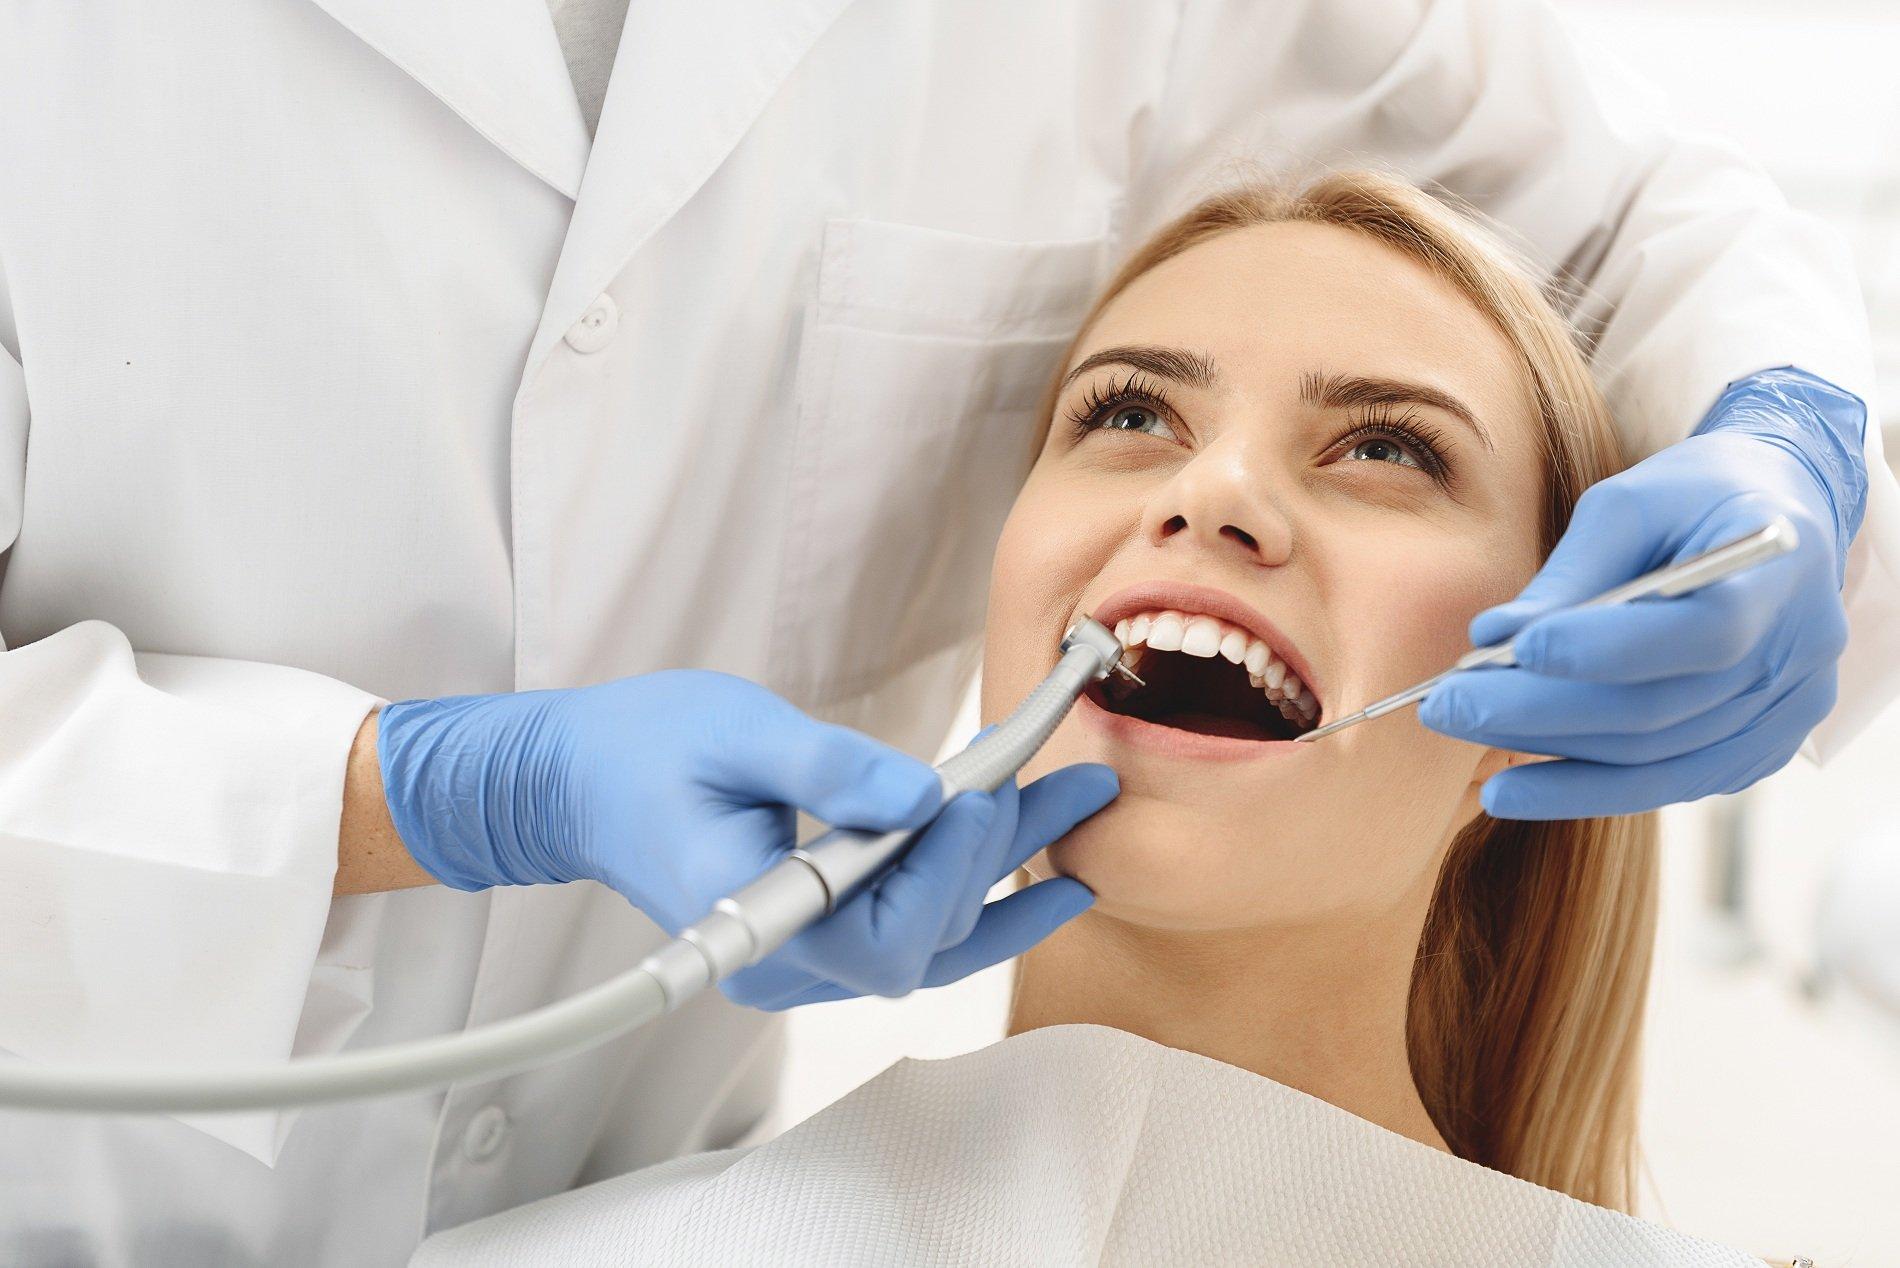 dentista opera sui denti di una paziente